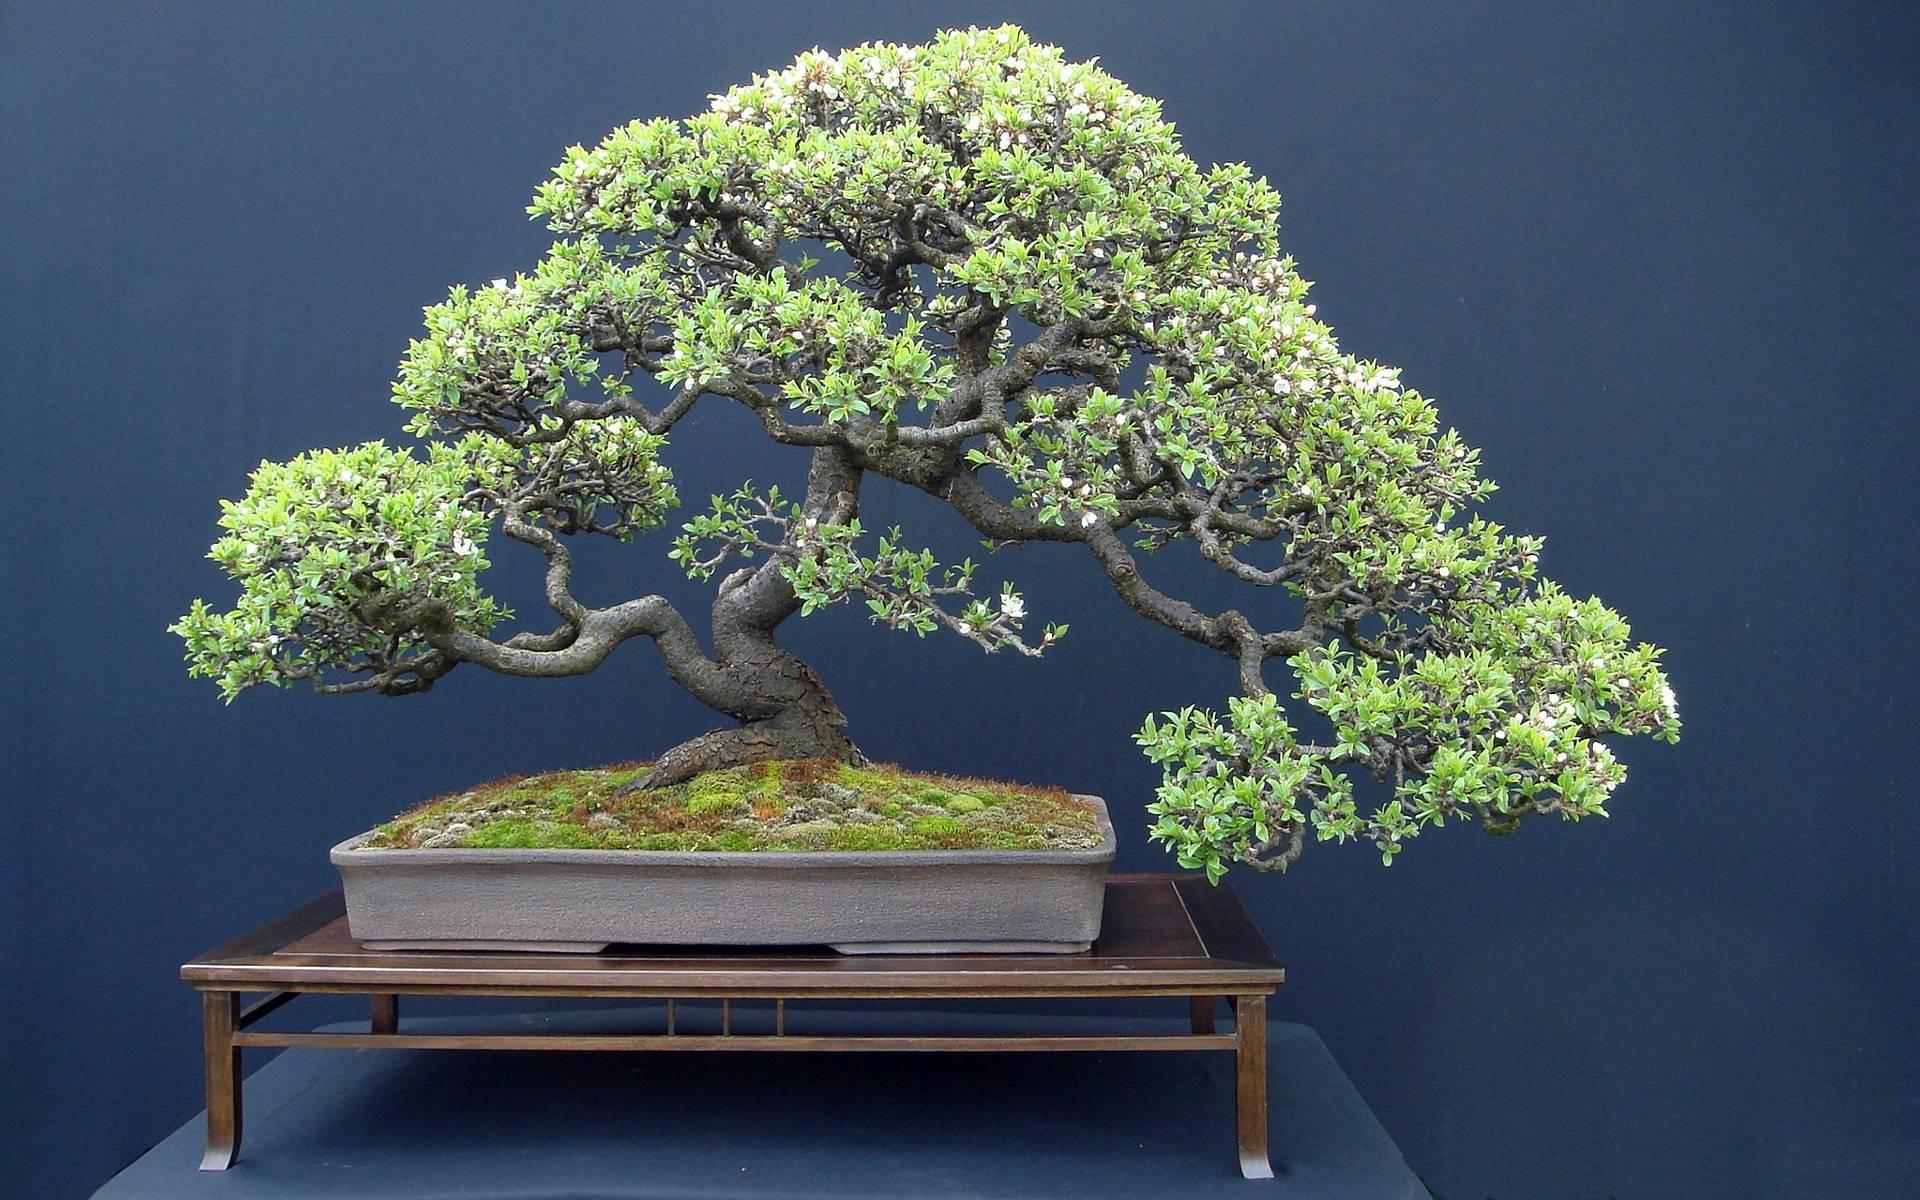 Bonsai Tree Wallpapers Top Free Bonsai Tree Backgrounds Wallpaperaccess